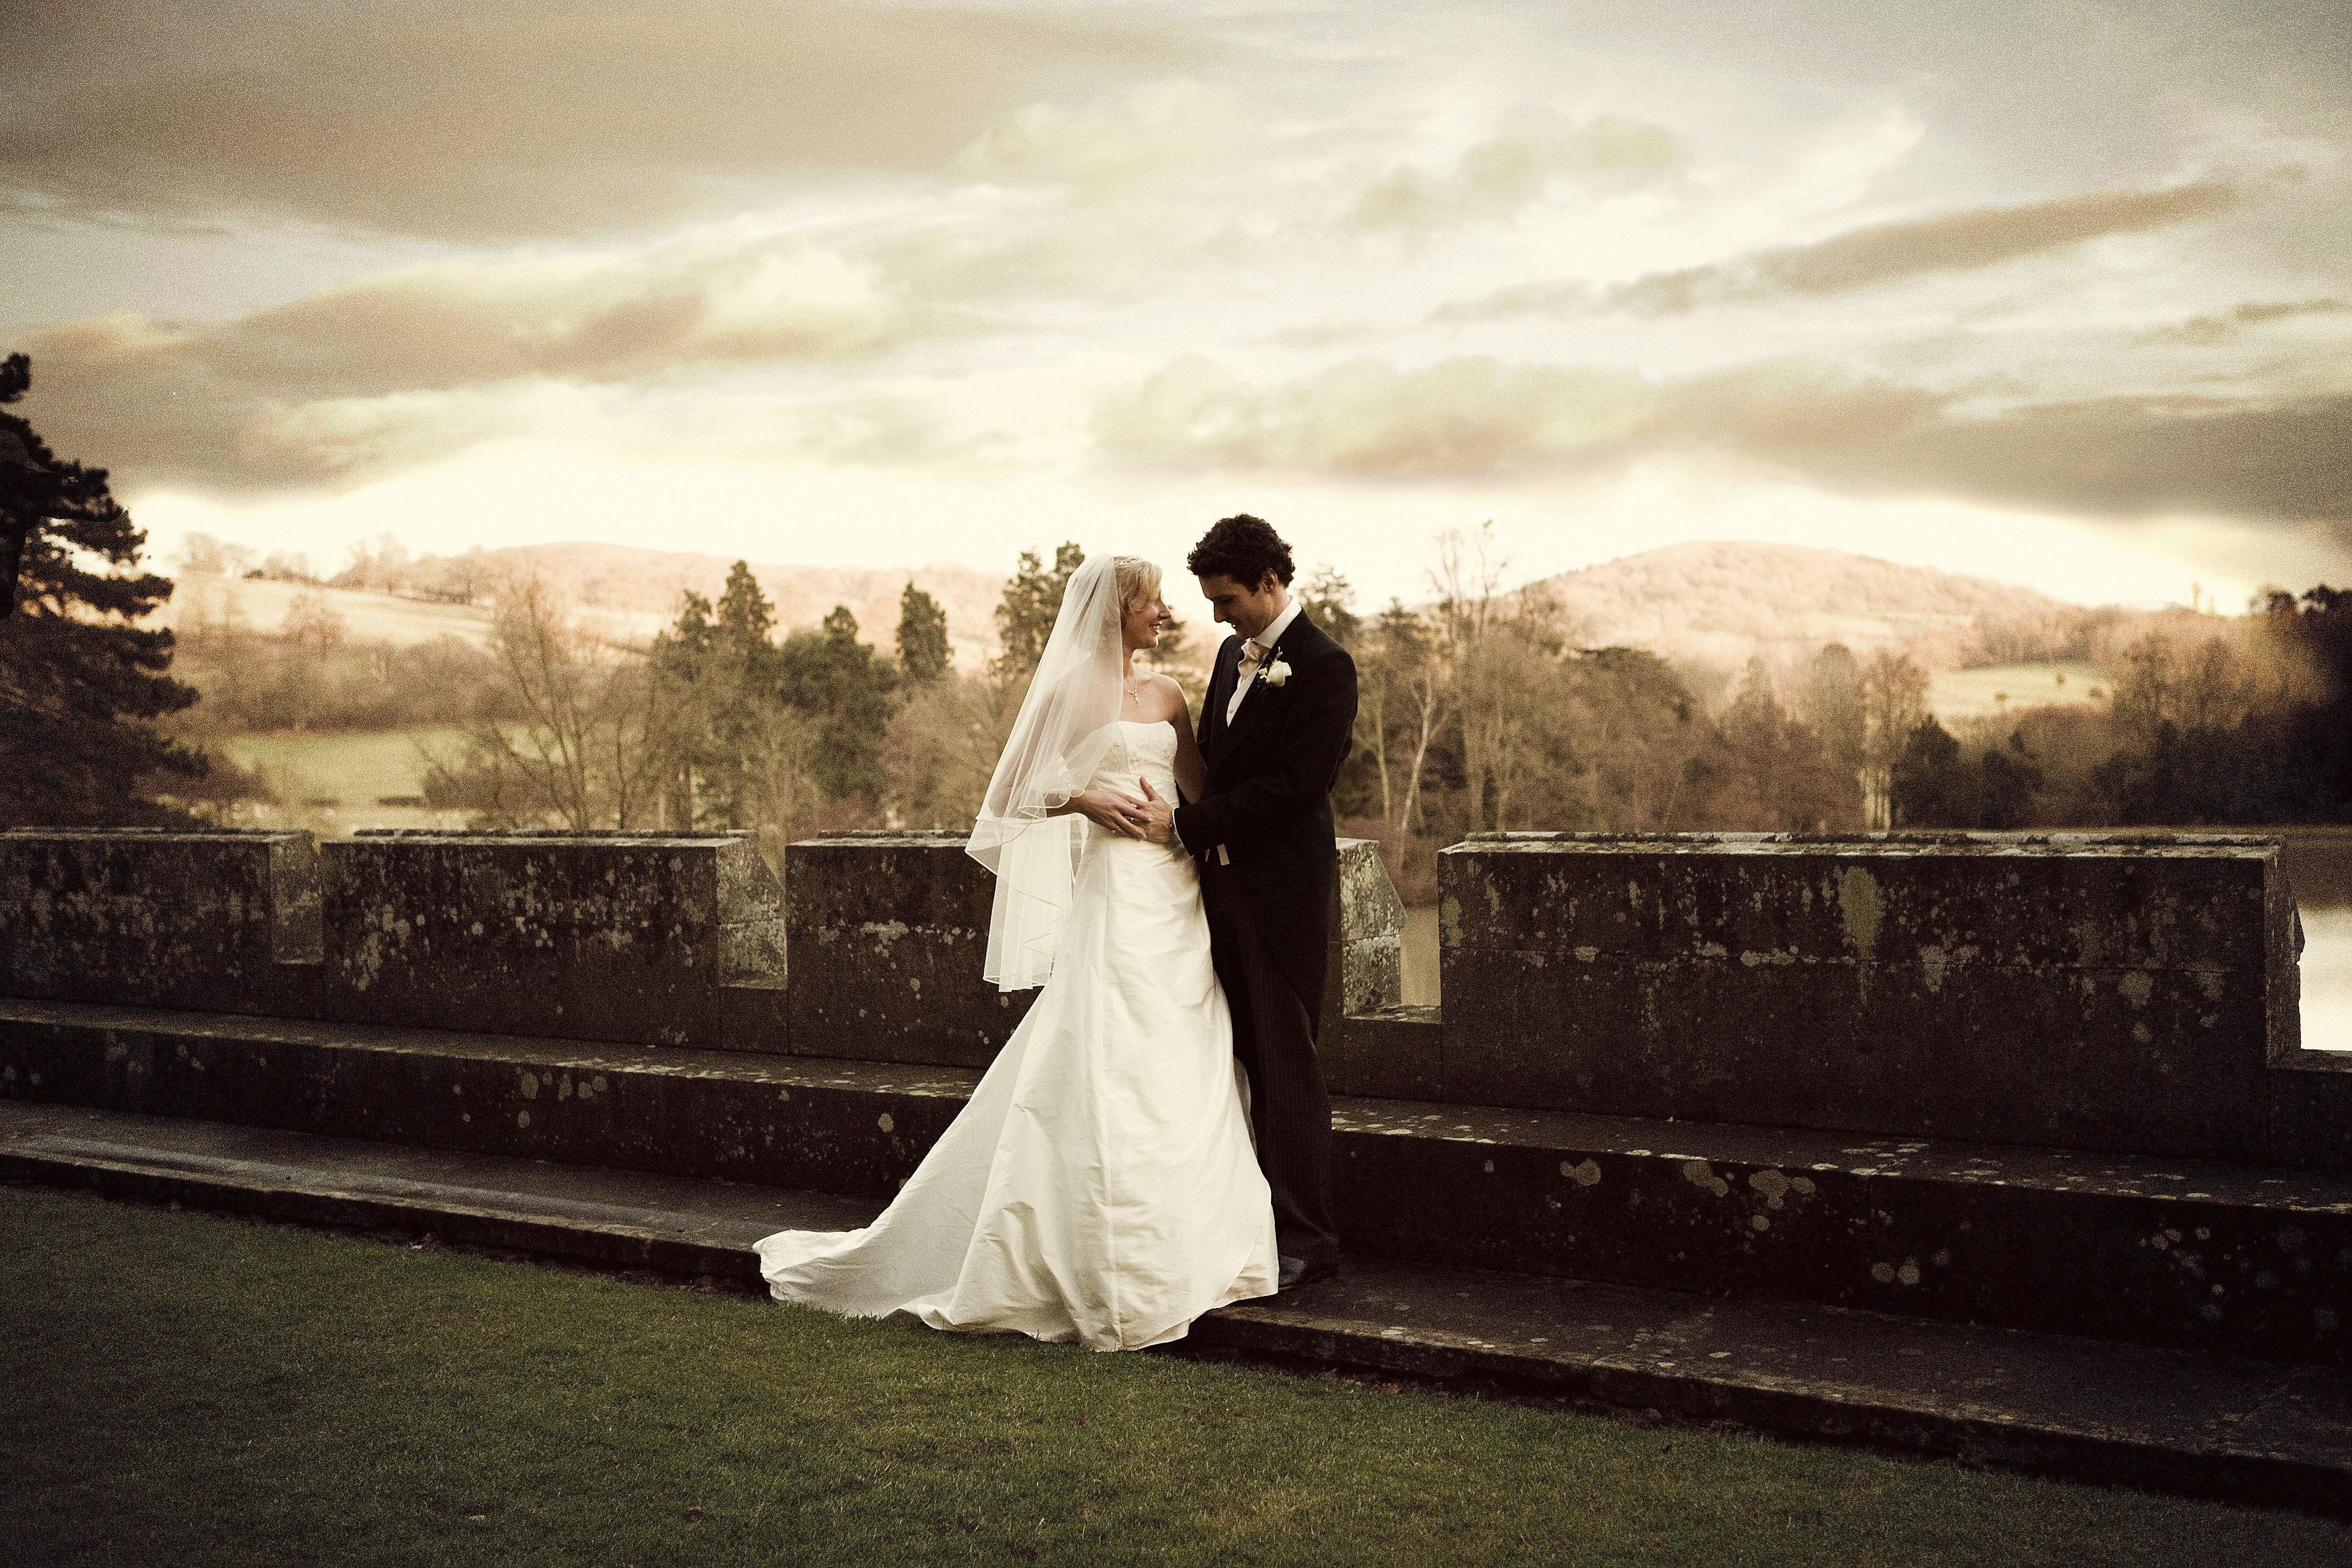 A romantic moment at Eastnor Castle  www.eastnorcastle.com #eastnorcastle A romantic, fairytale exclusive-use castle wedding venue.